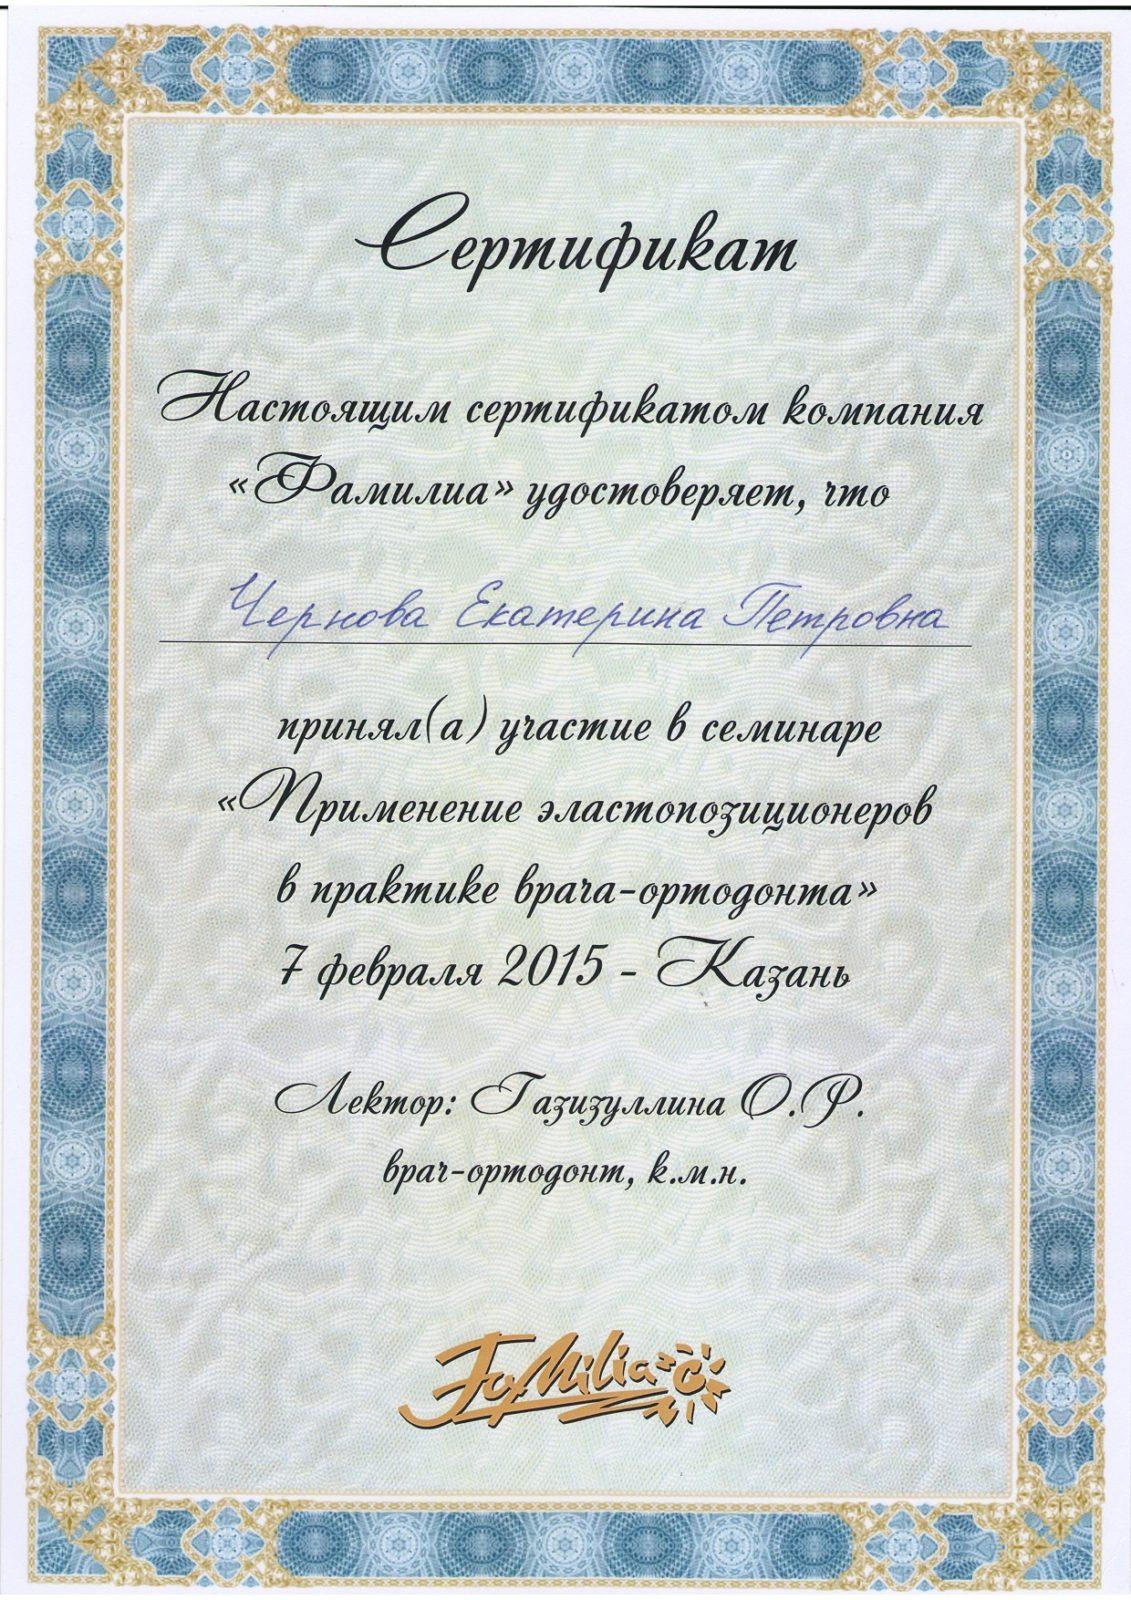 http://oris-vidnoe.ru/wp-content/uploads/2021/06/chernova-4.jpg